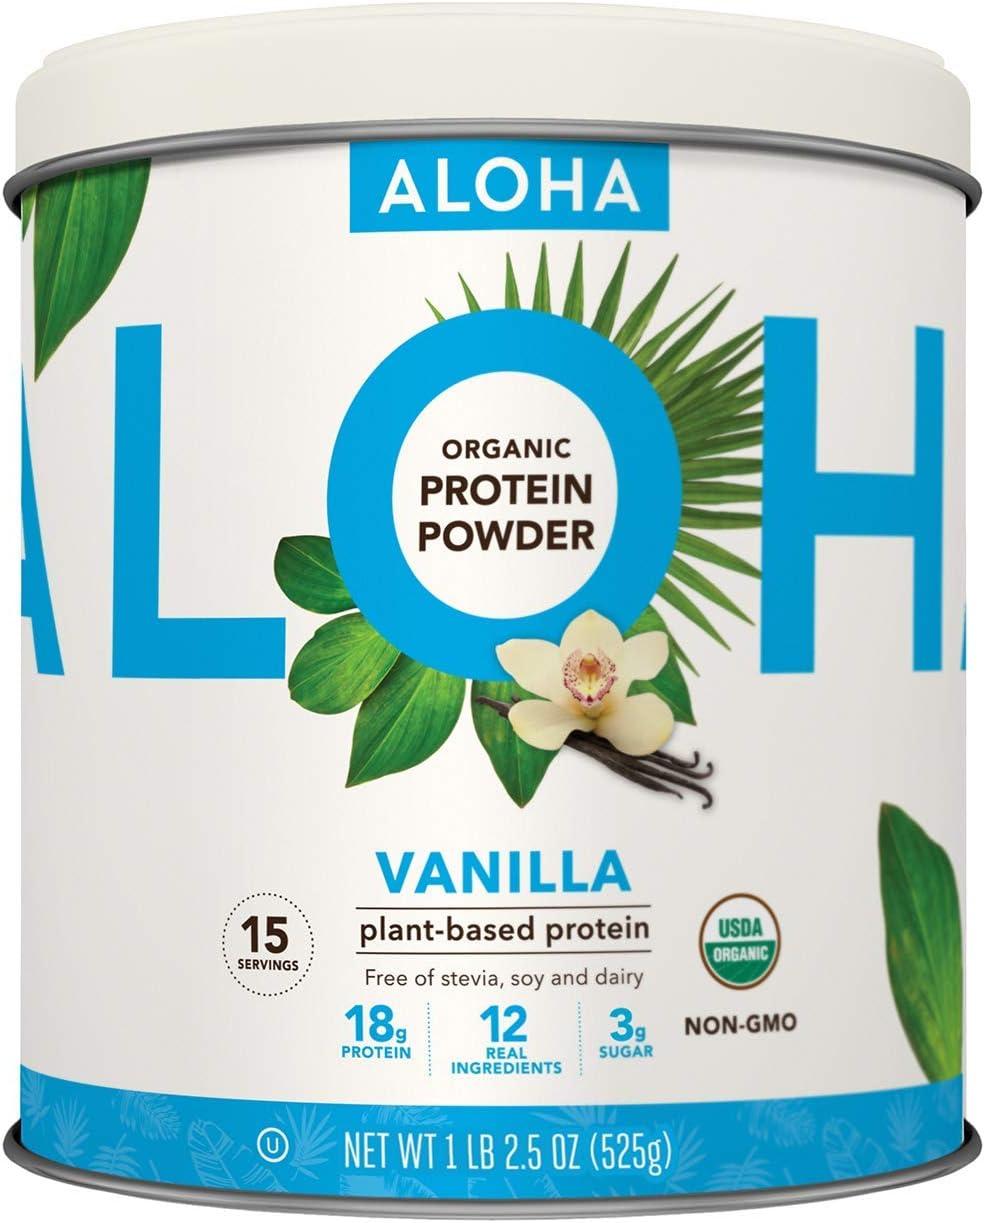 Plant-Based Protein Powder   Organic Vanilla Keto Friendly Vegan Protein with MCT Oil, 18.5 oz, Makes 15 Shakes, Vegan, Gluten Free, Non-GMO, Stevia Free & Erythritol Free, Soy Free, Dairy Free & Only 3g Sugar: Health & Personal Care